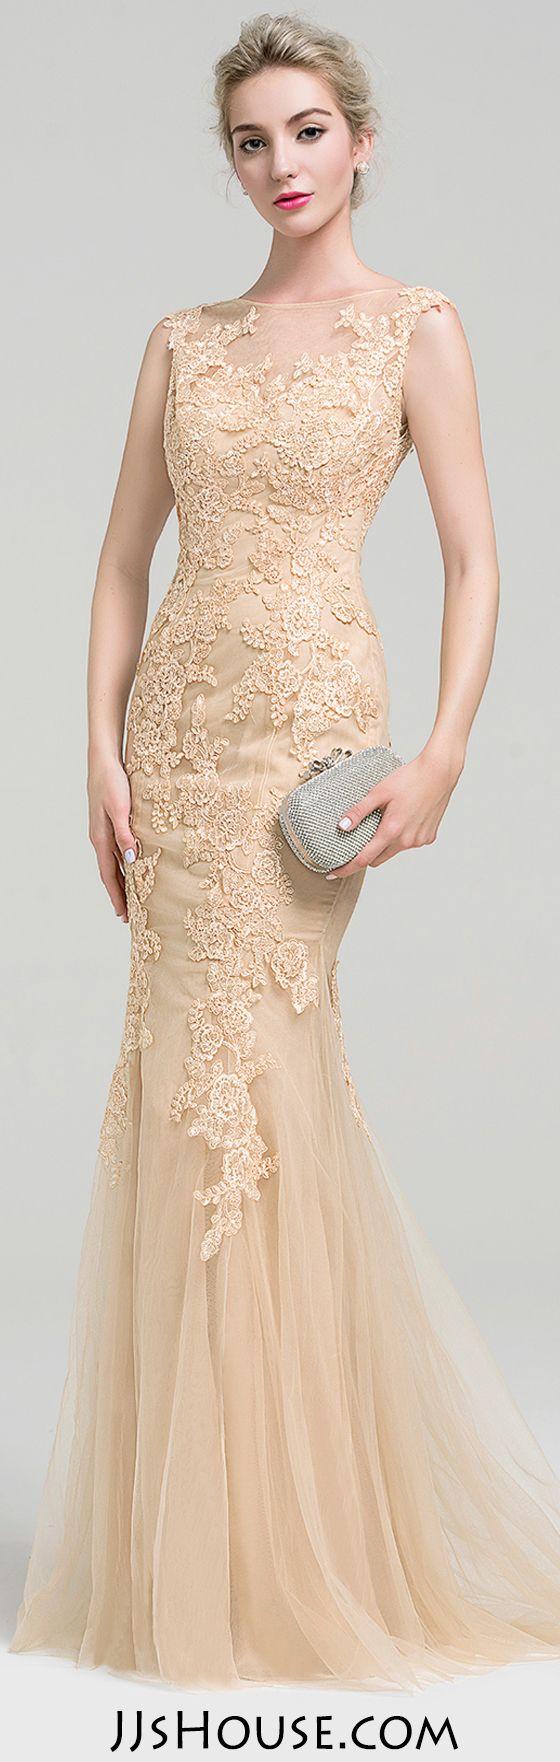 Elegant Trumpet/Mermaid Scoop Neck Floor-Length Tulle Lace Evening Dress. #JJsHouse